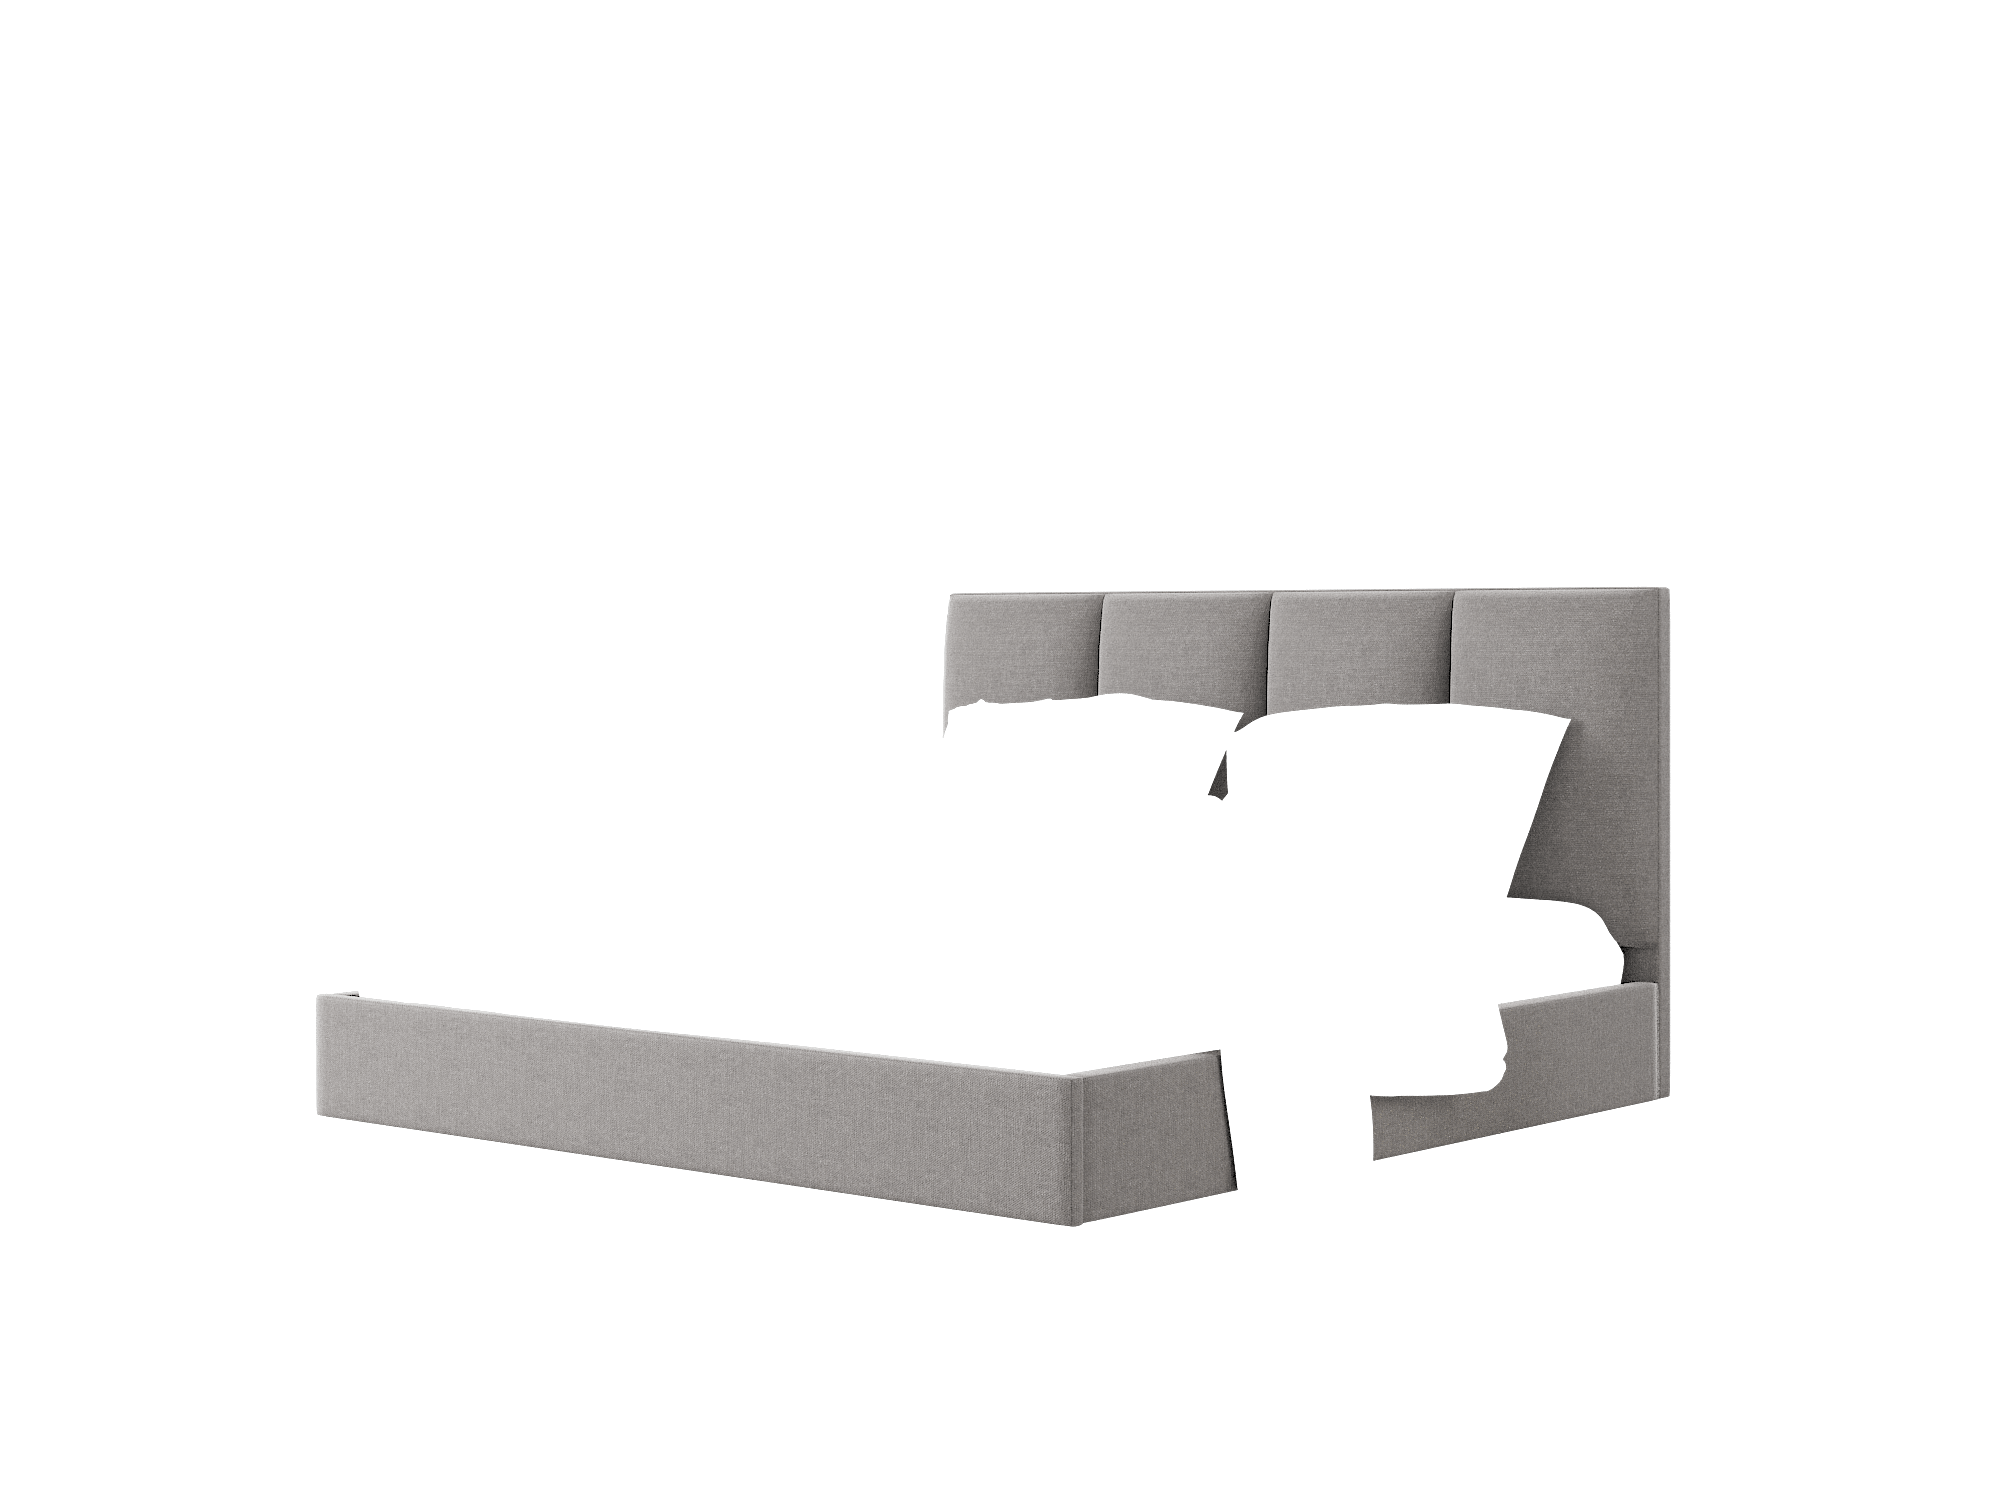 Celine Sasha Grey Bed King Room Texture